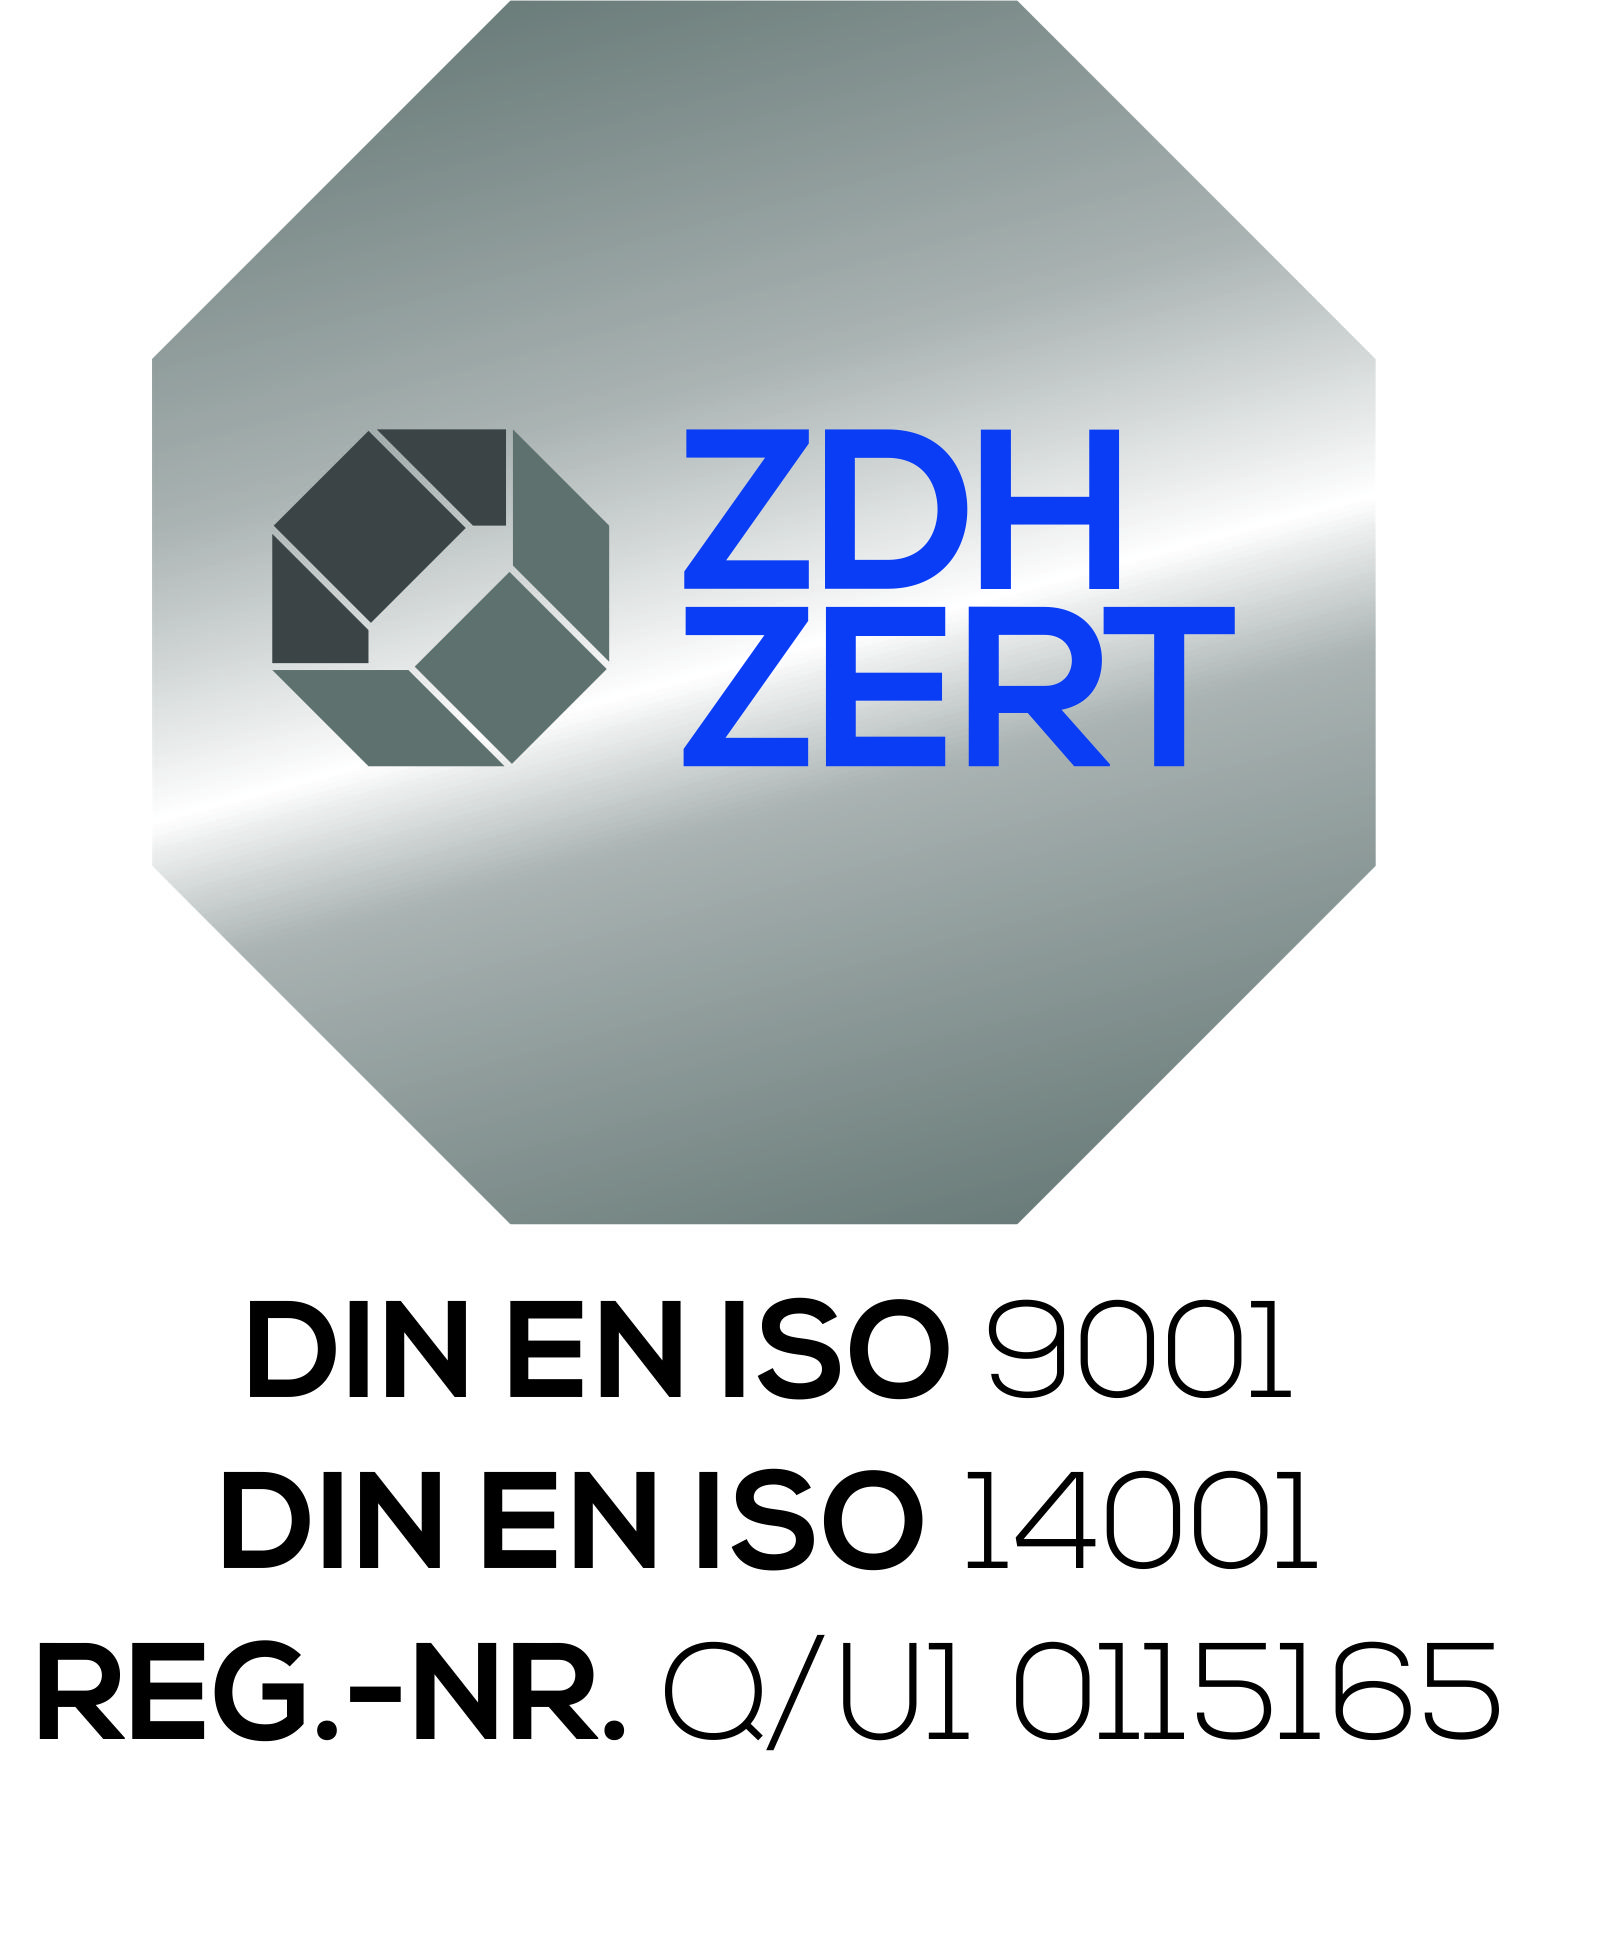 Logo DIN ISO Zertifizierungen